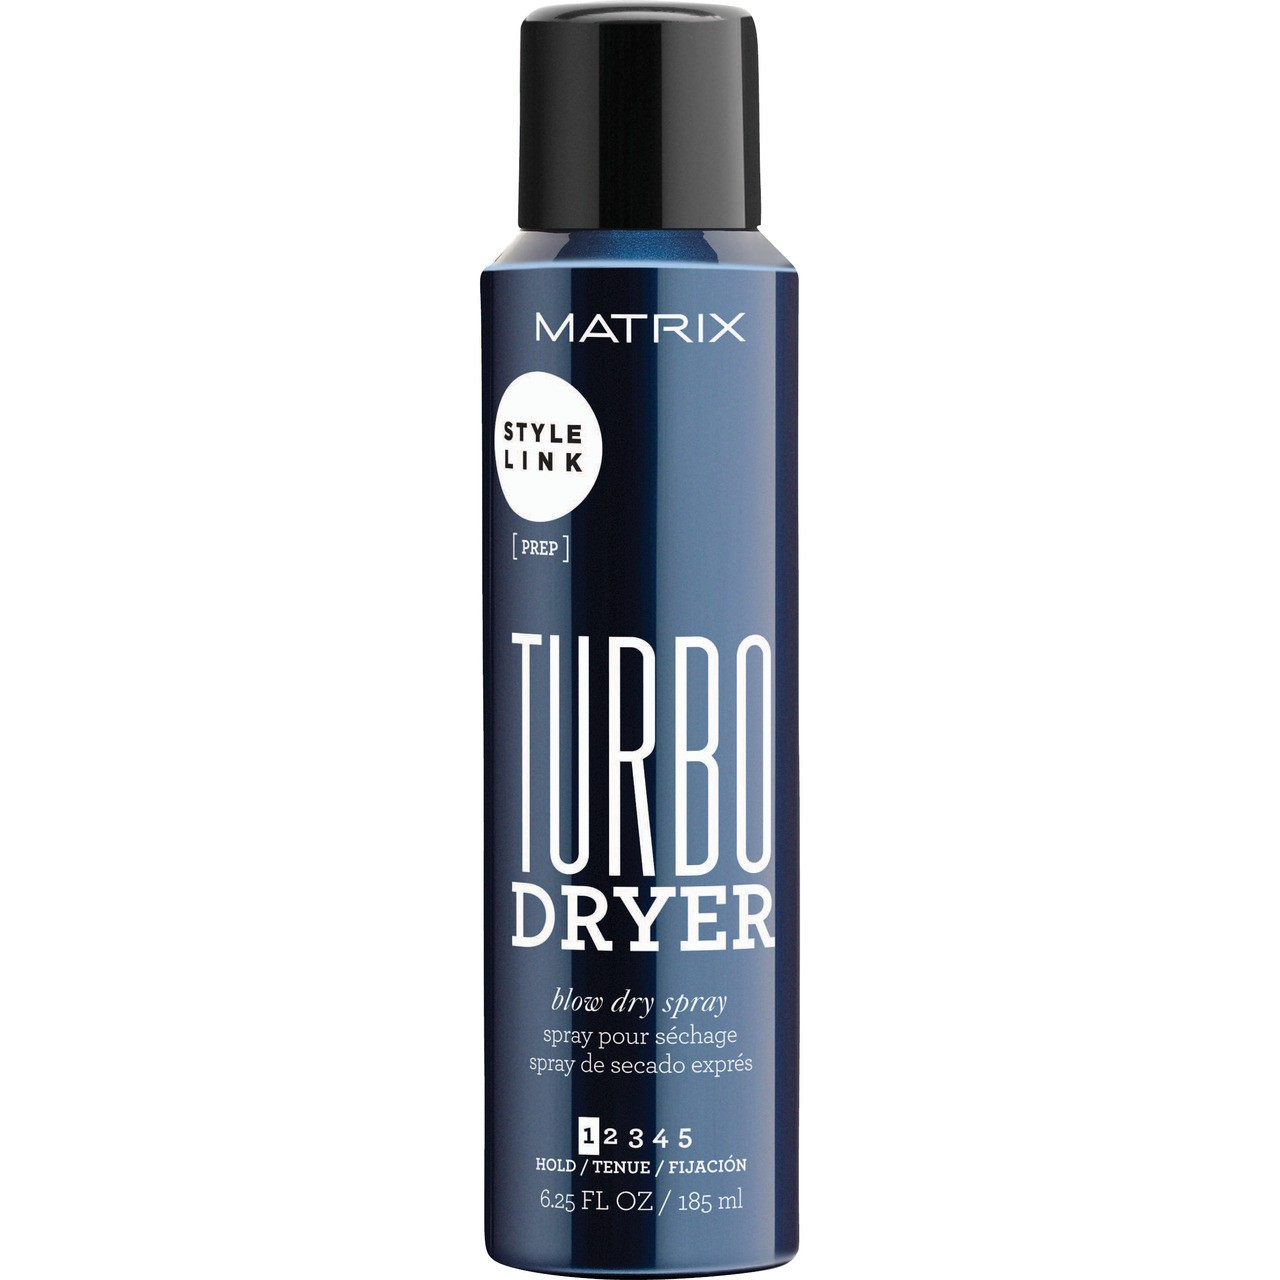 MATRIX Style Link Turbo Dryer 185ml 1